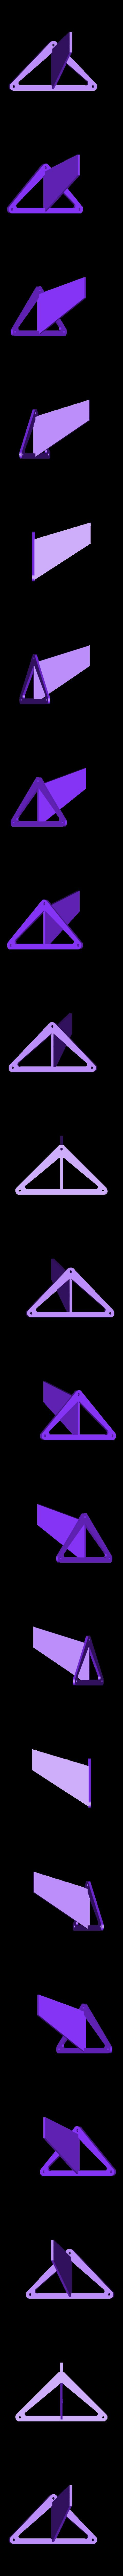 InductrixFrame_light2_fin.stl Download STL file Inductrix / Tiny Whoop light racing frame • 3D print design, Mr_Disintegrator